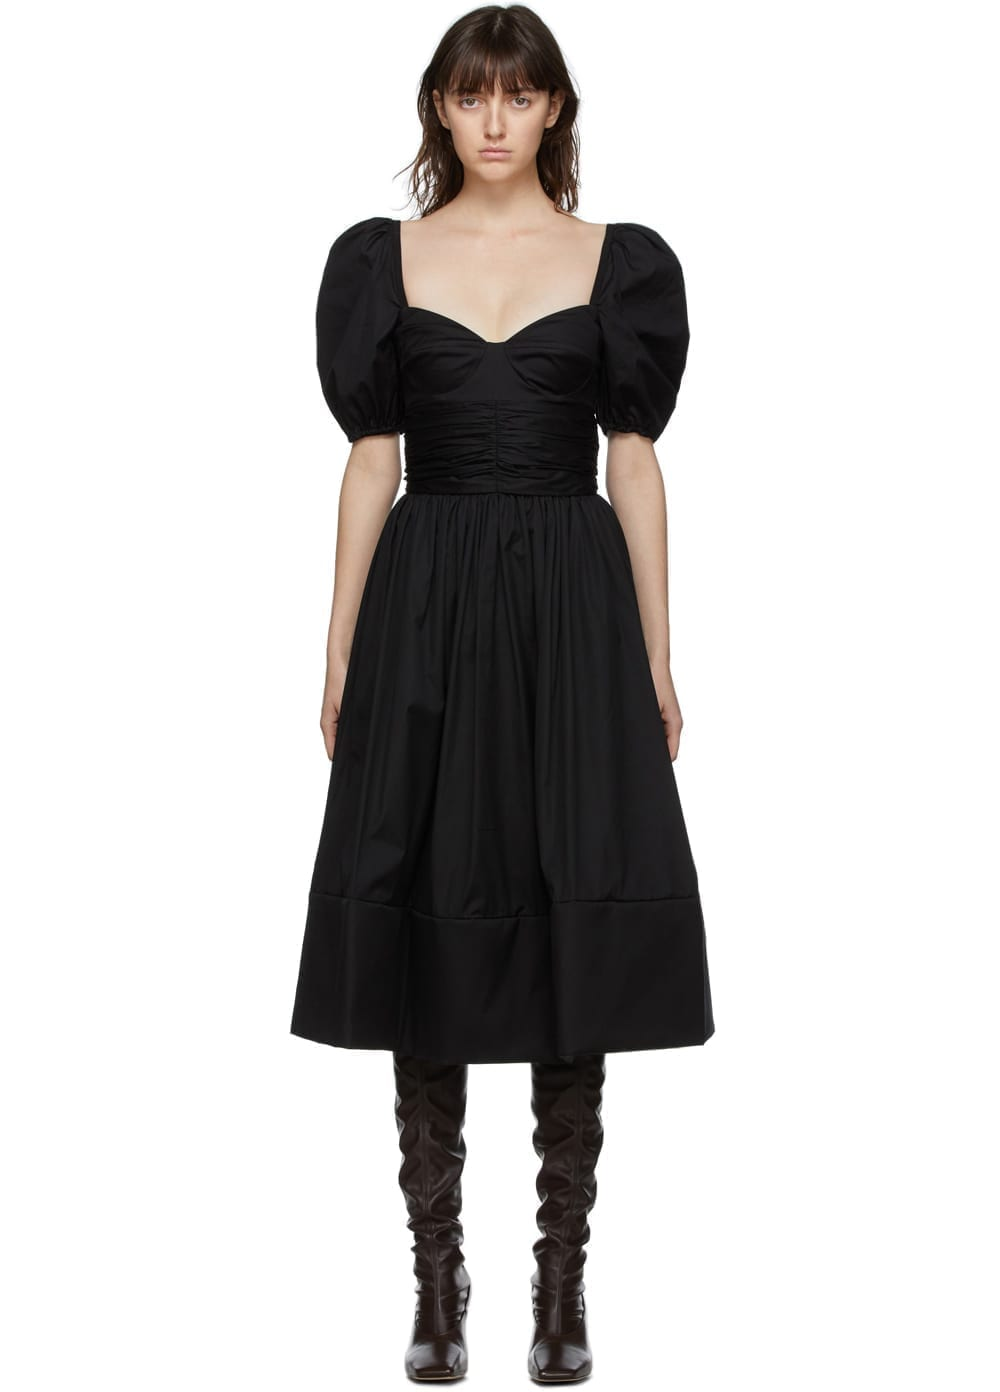 BROCK COLLECTION Black Rosette Dress